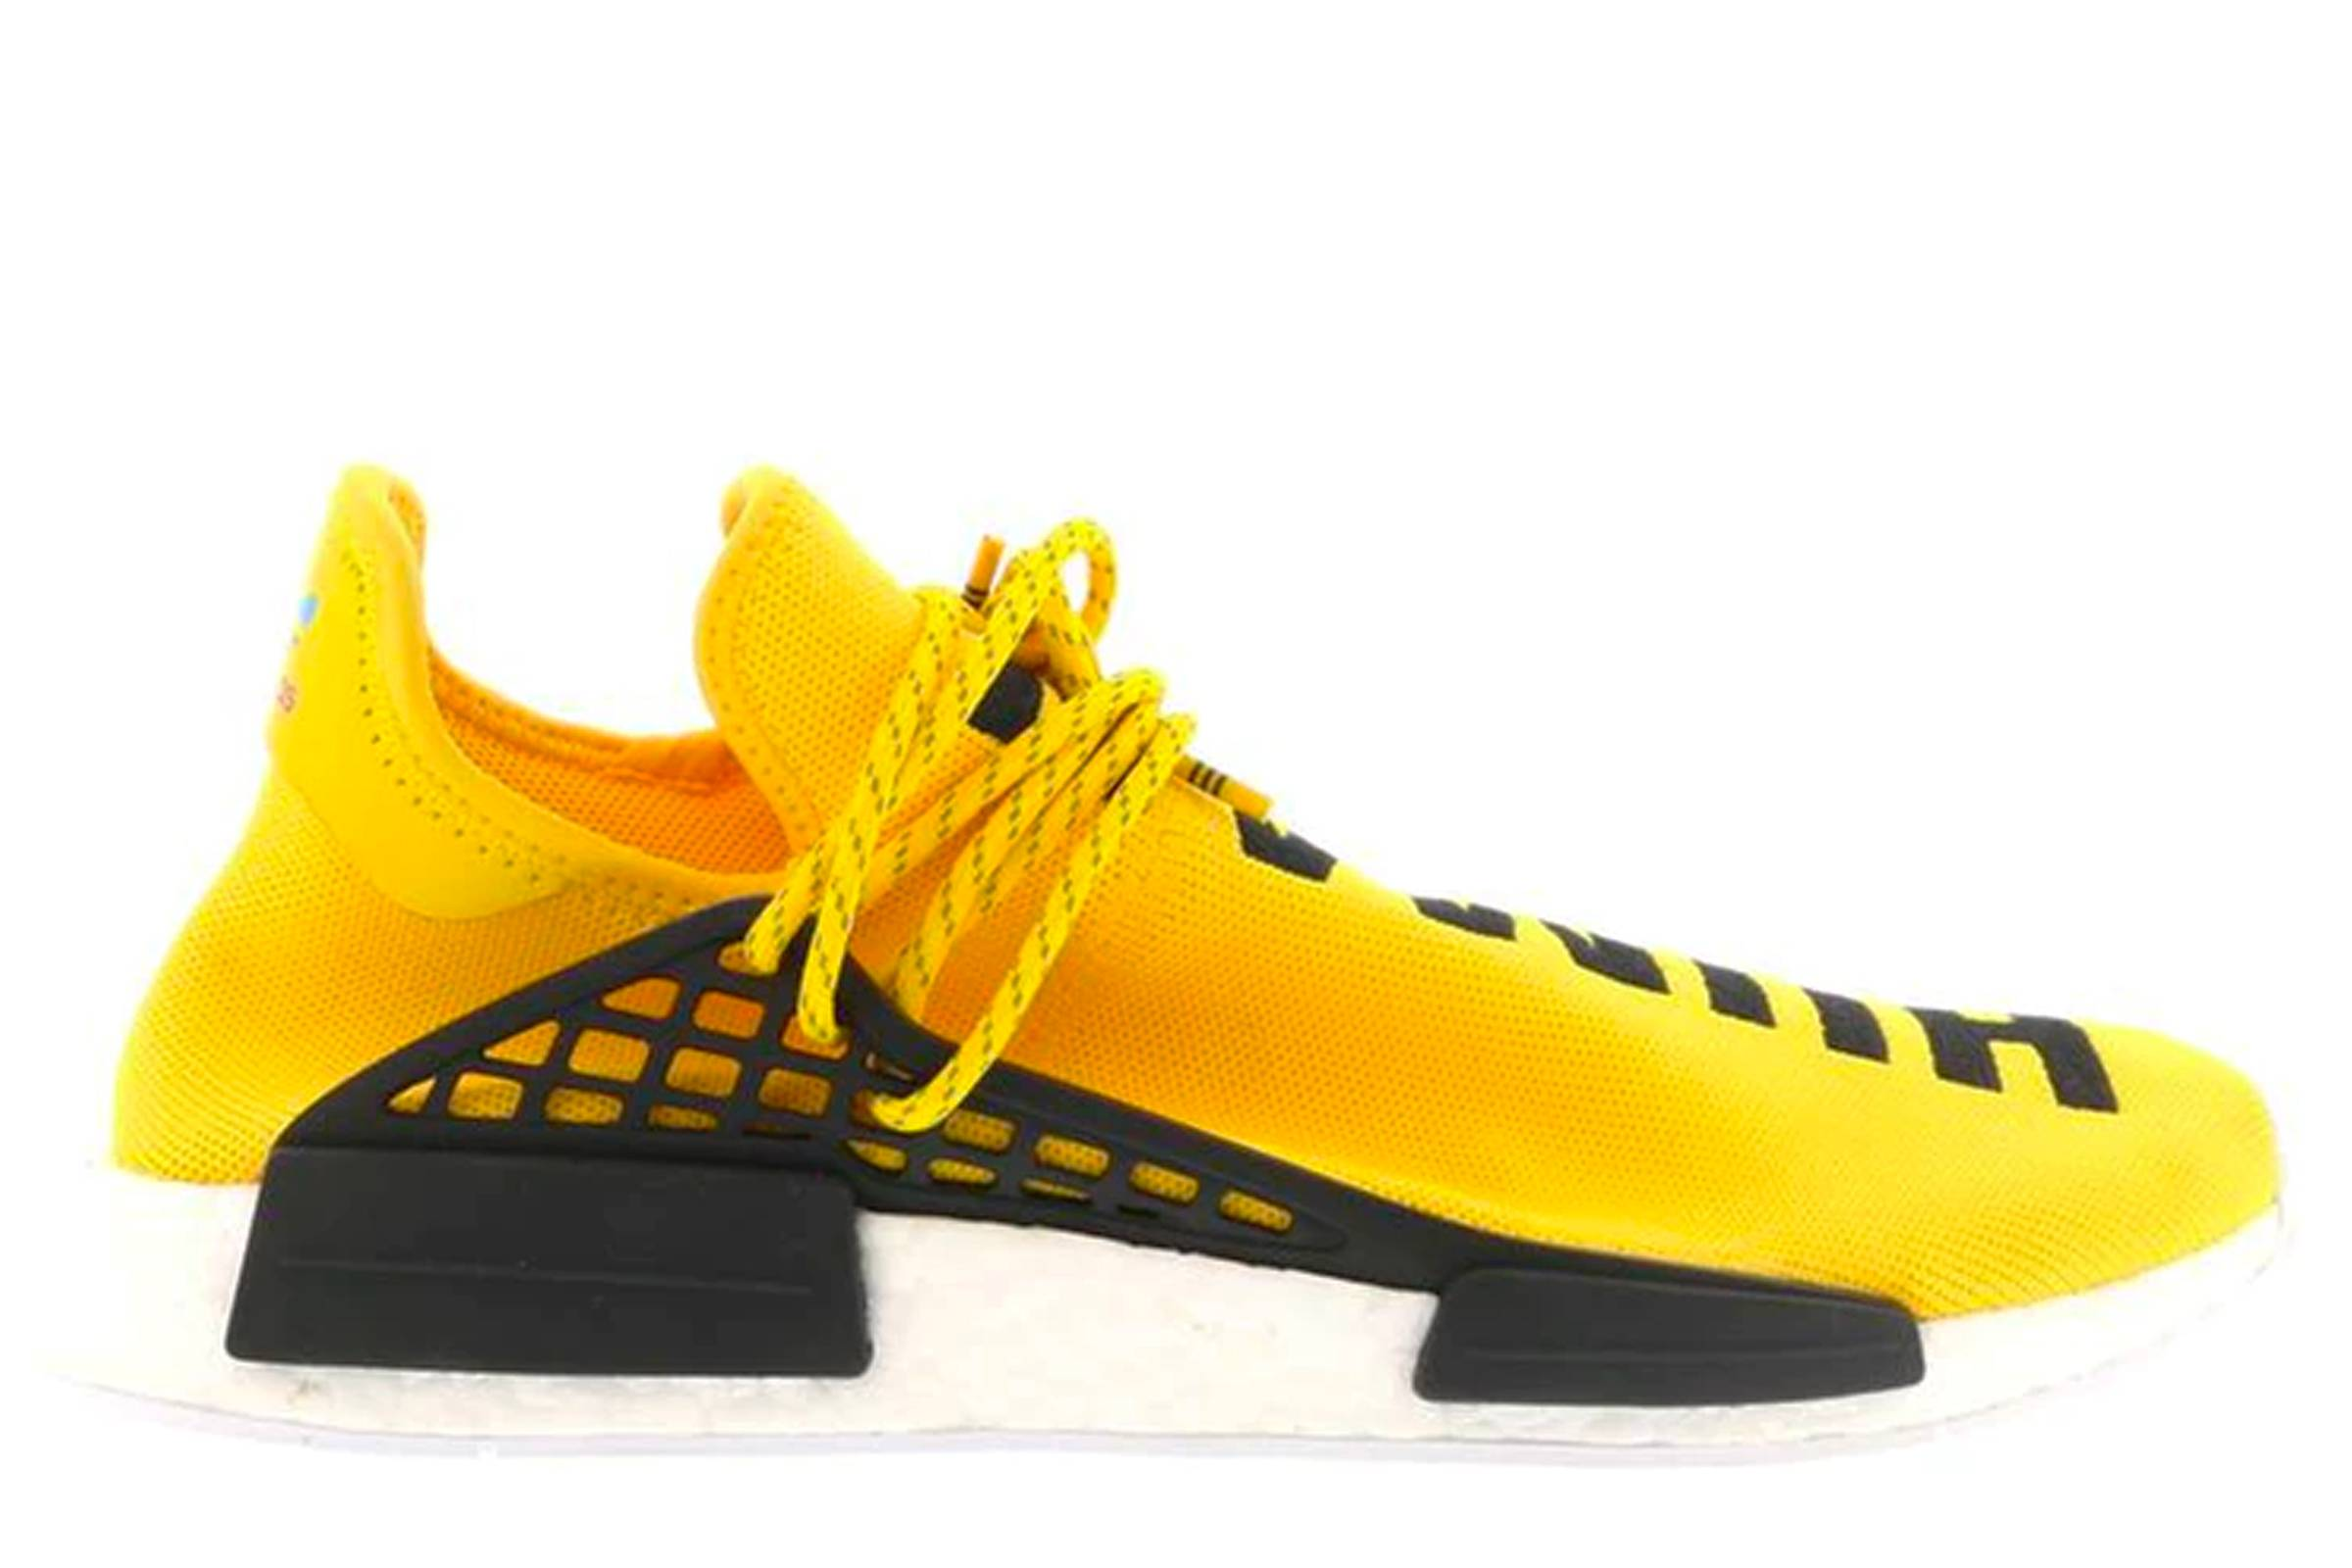 adidas x Pharrell Williams HU NMD Human Race, Yellow Version (2016) история adidas Boost